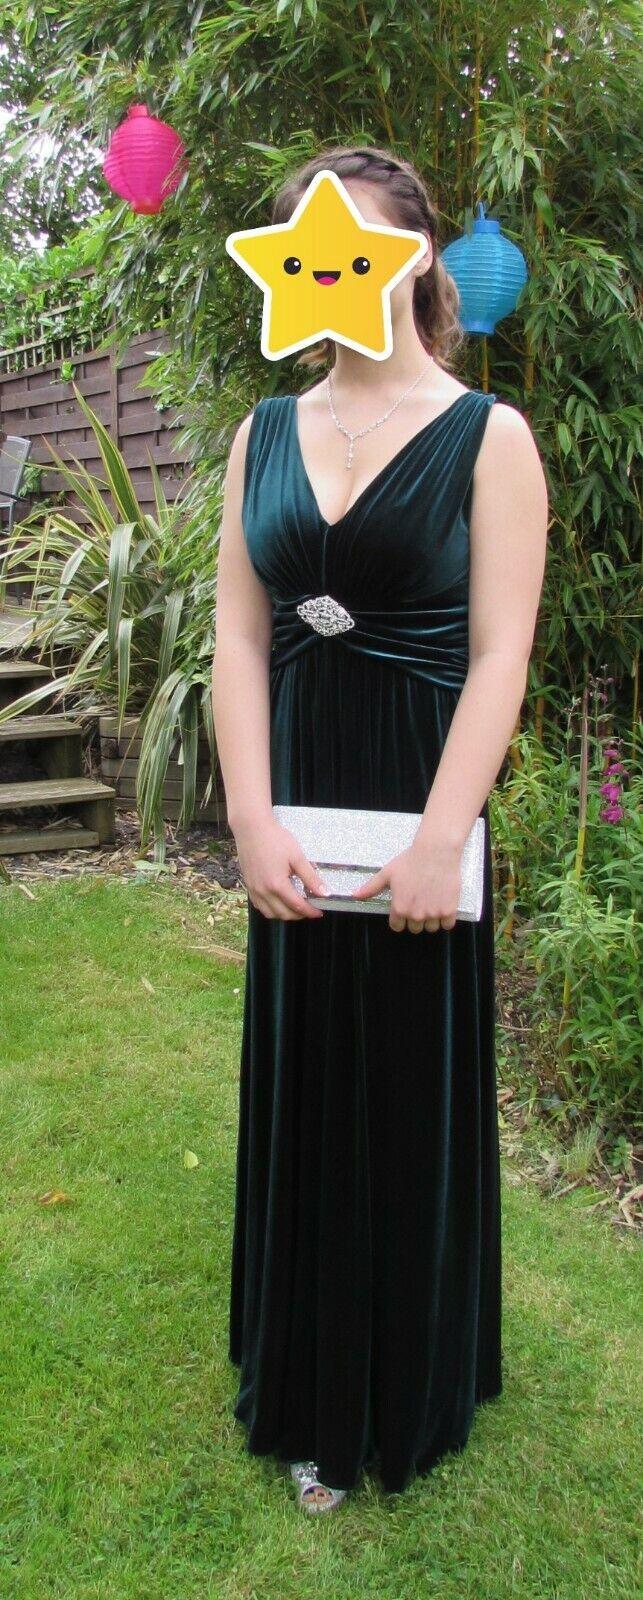 d52c6c402db Elegant Dark Bottle Long Empire Prom Dress Ariella London Sz 10 Emerald  Green niplrs19732-Dresses